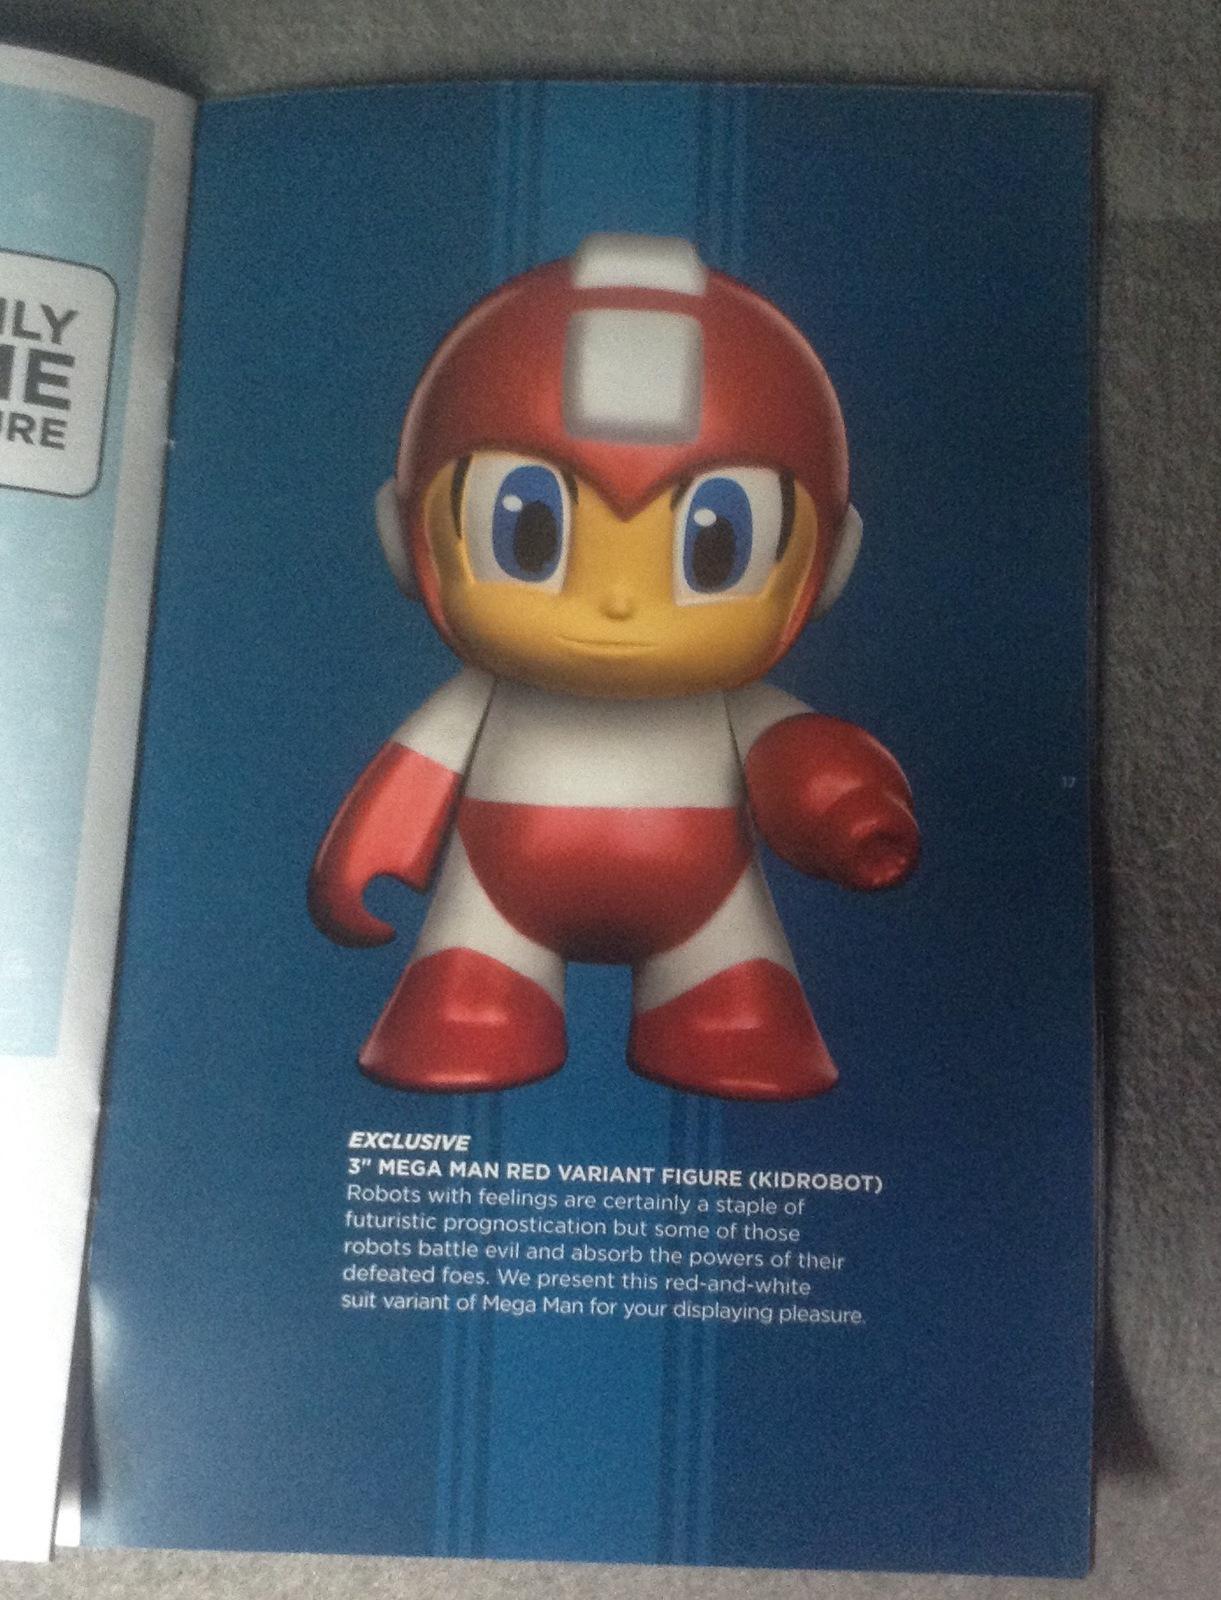 "3"" Mega Man Red Variant Figure Mini Blind Box LOOTCRATE exclusive kidrobot"